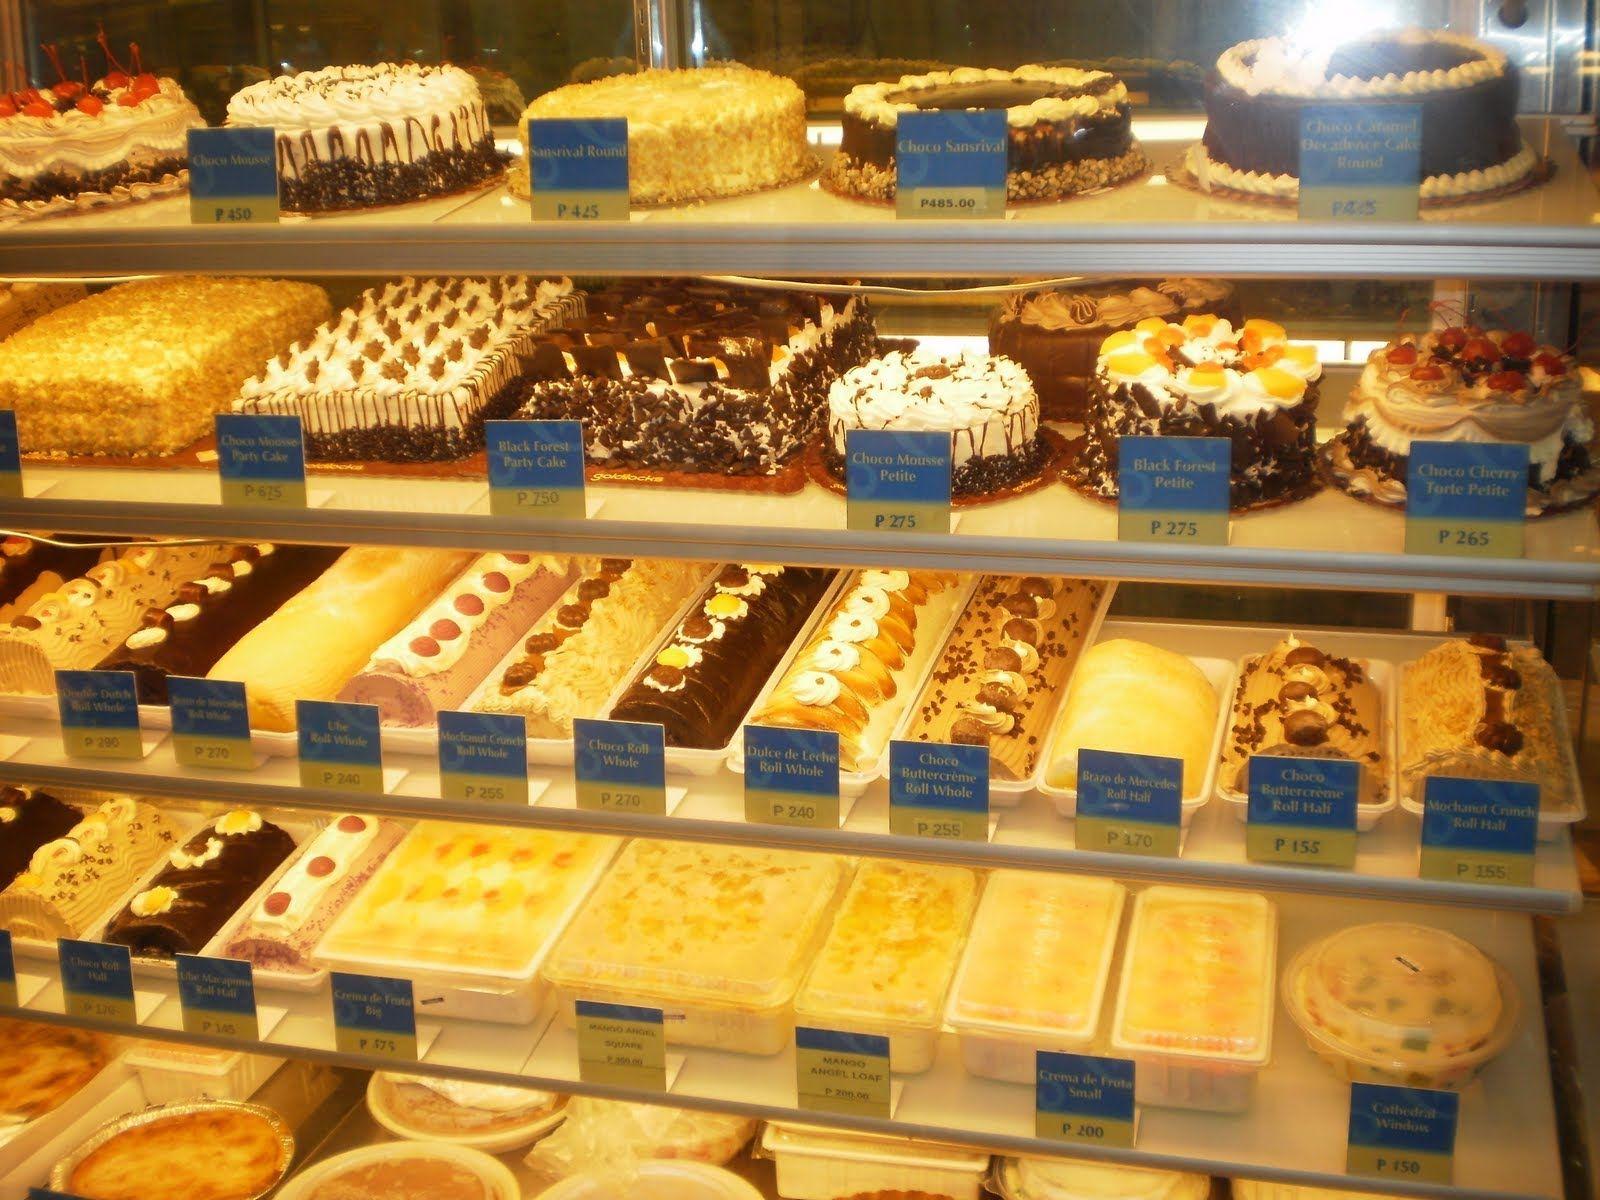 Goldilocks Bakery Bake Shop Philippines Buying Birthday Cake ...